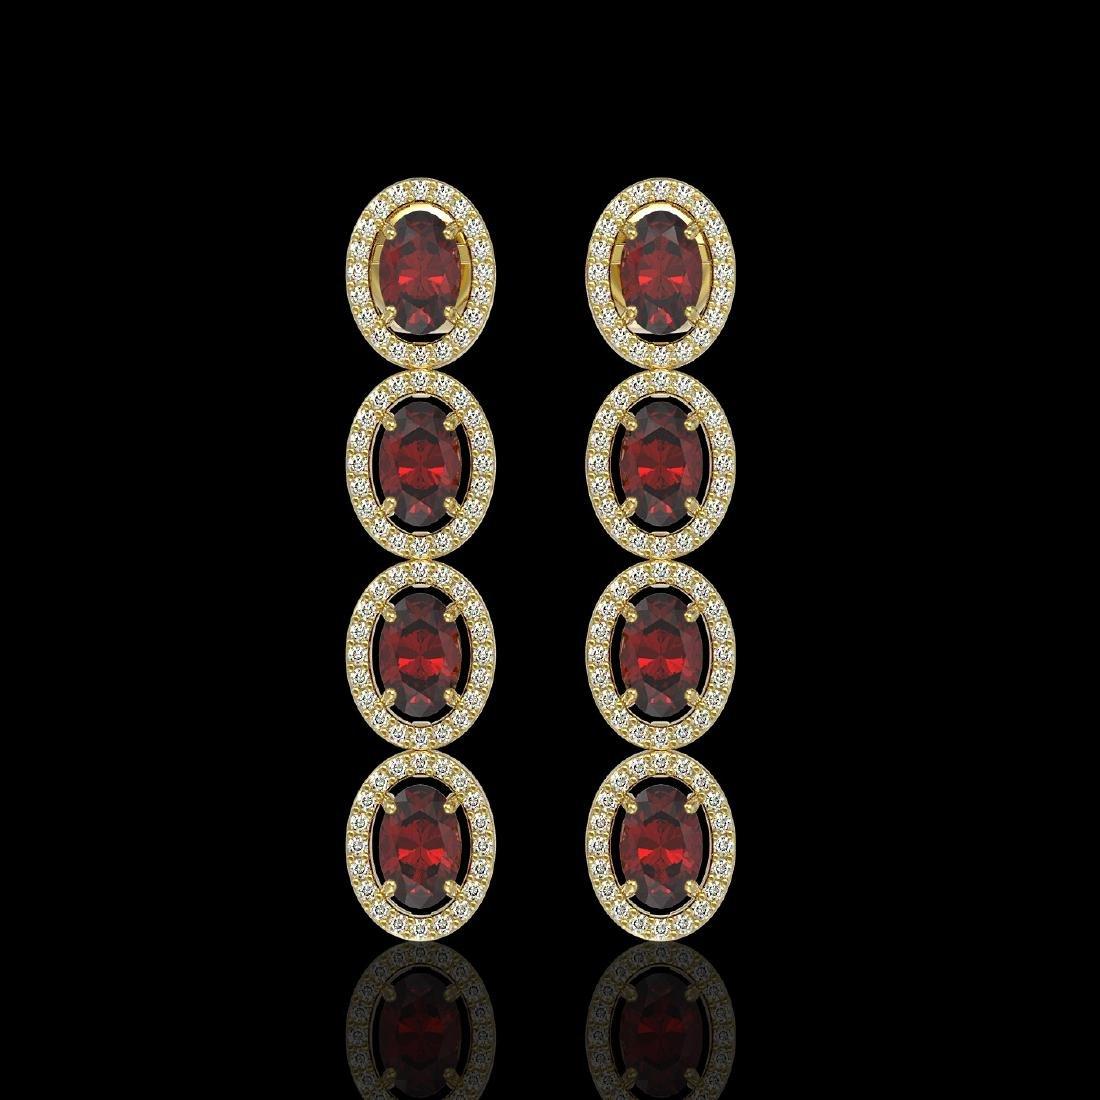 6.2 CTW Garnet & Diamond Halo Earrings 10K Yellow Gold